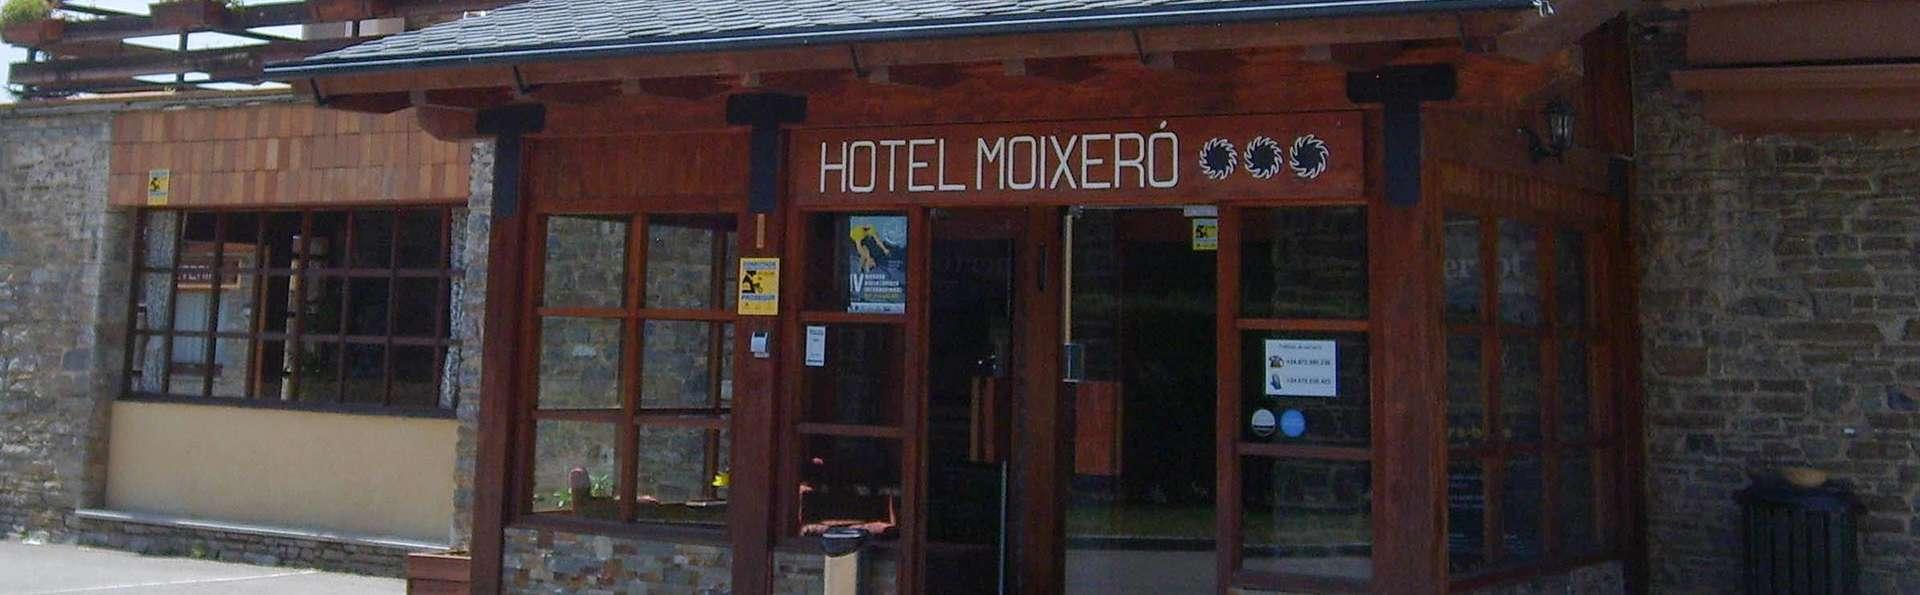 Hotel Moixeró - EDIT_FRONT_01.jpg